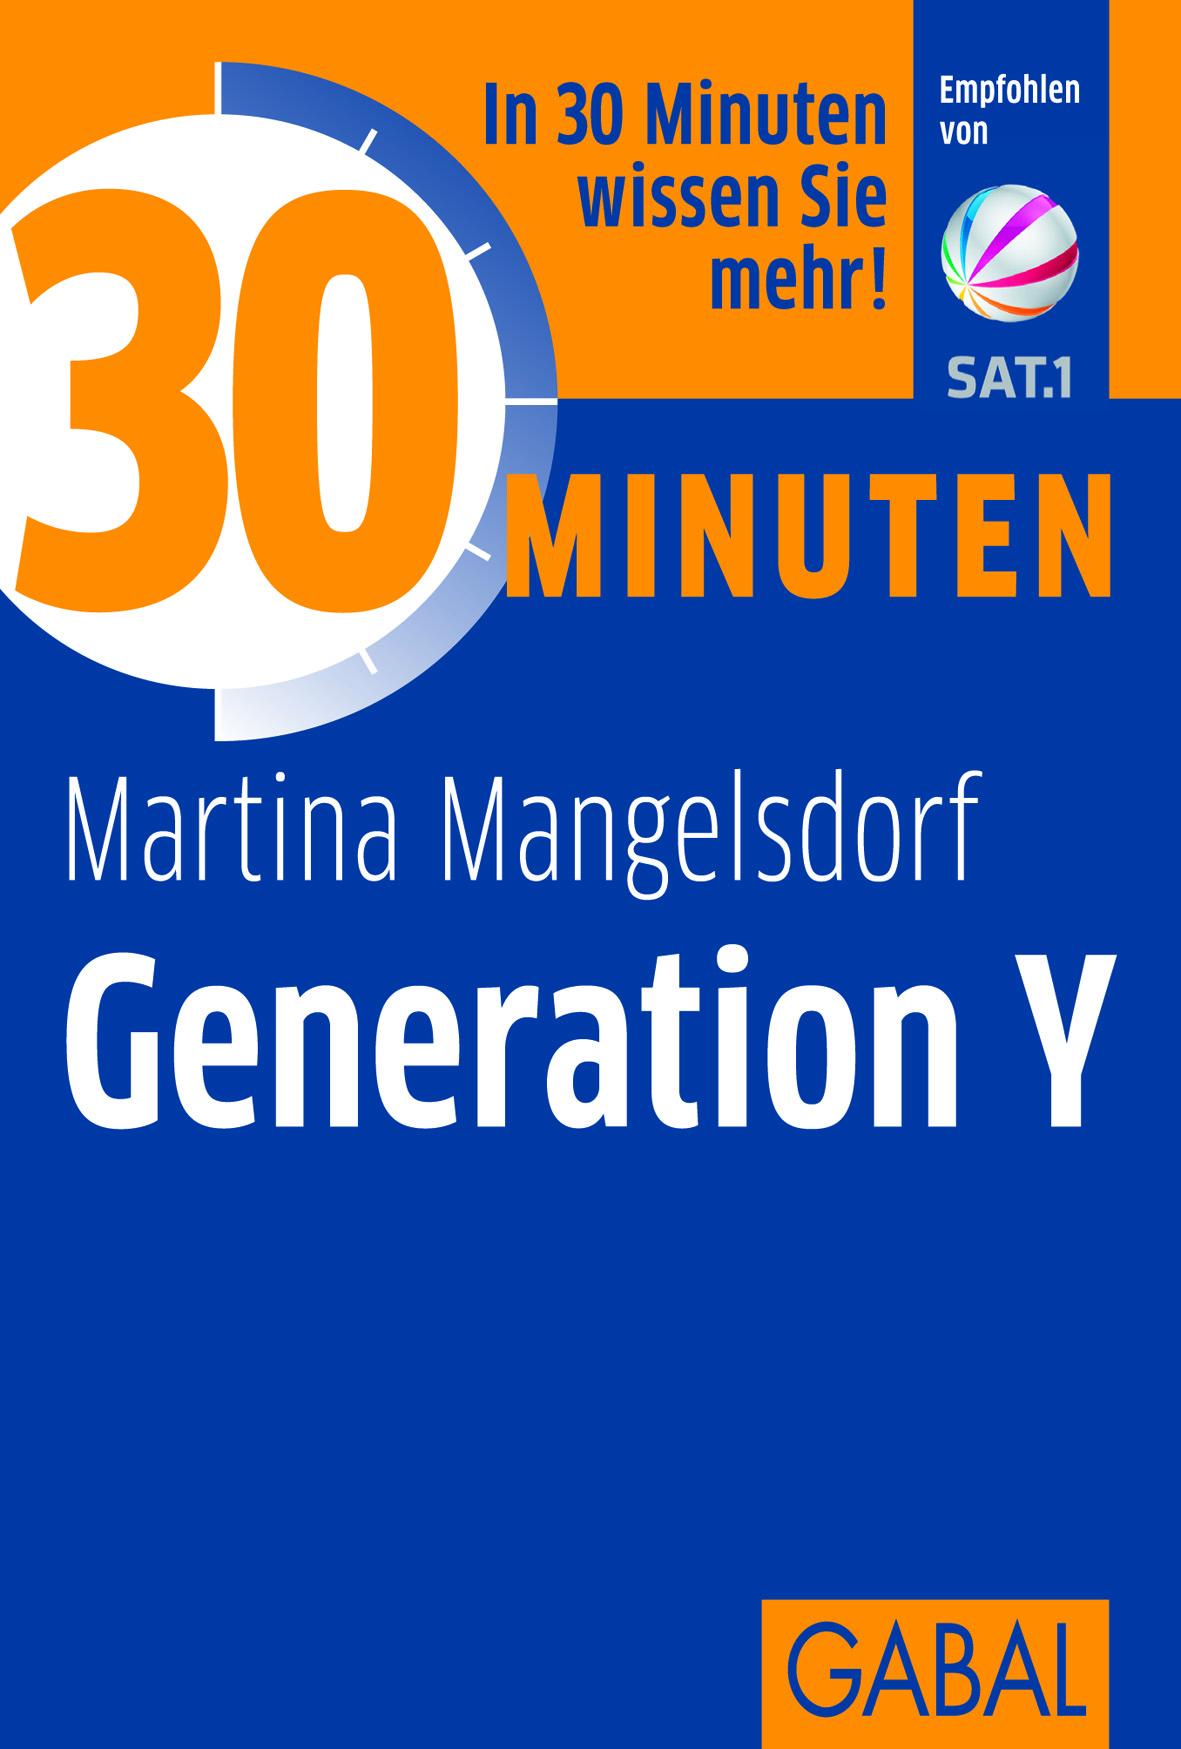 gabal verlag 30 minuten generation y ins buch blättern 30 minuten generation y buchcover